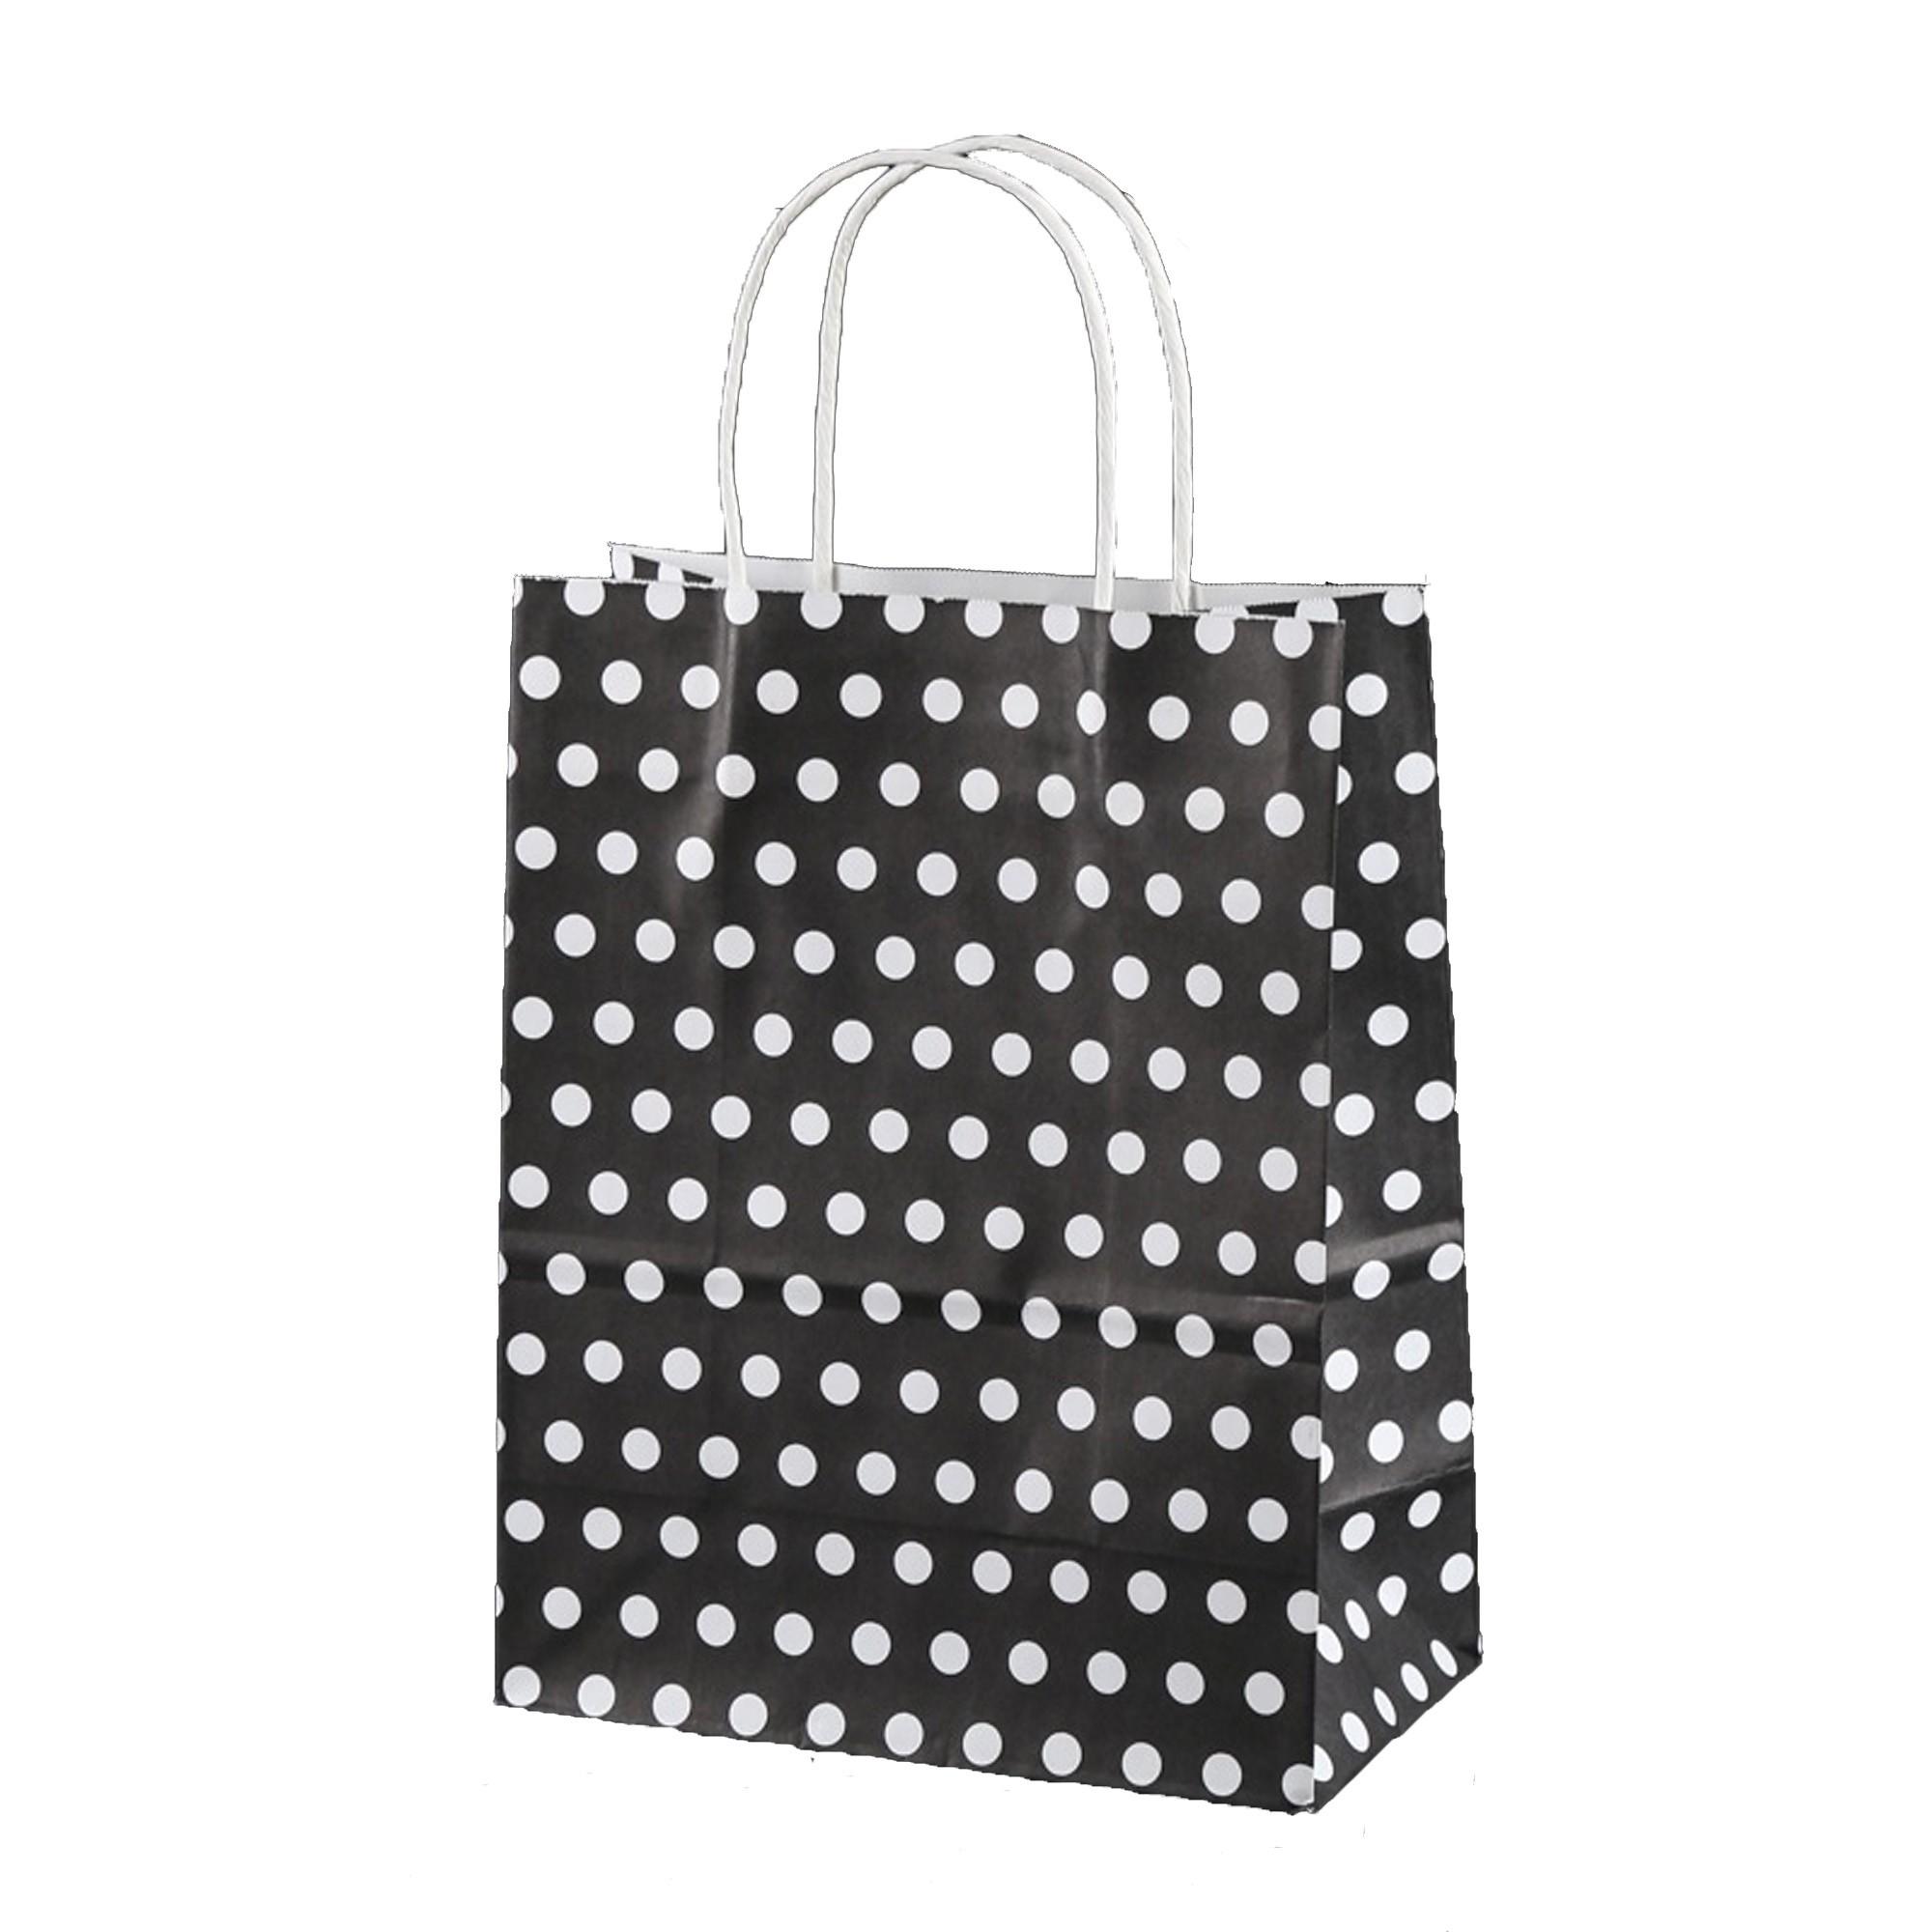 Black & White Polka Dot Paper Gift Bags 5.9 inch x 3.3 inch x 8.3 inch (36 Bags/Lot)